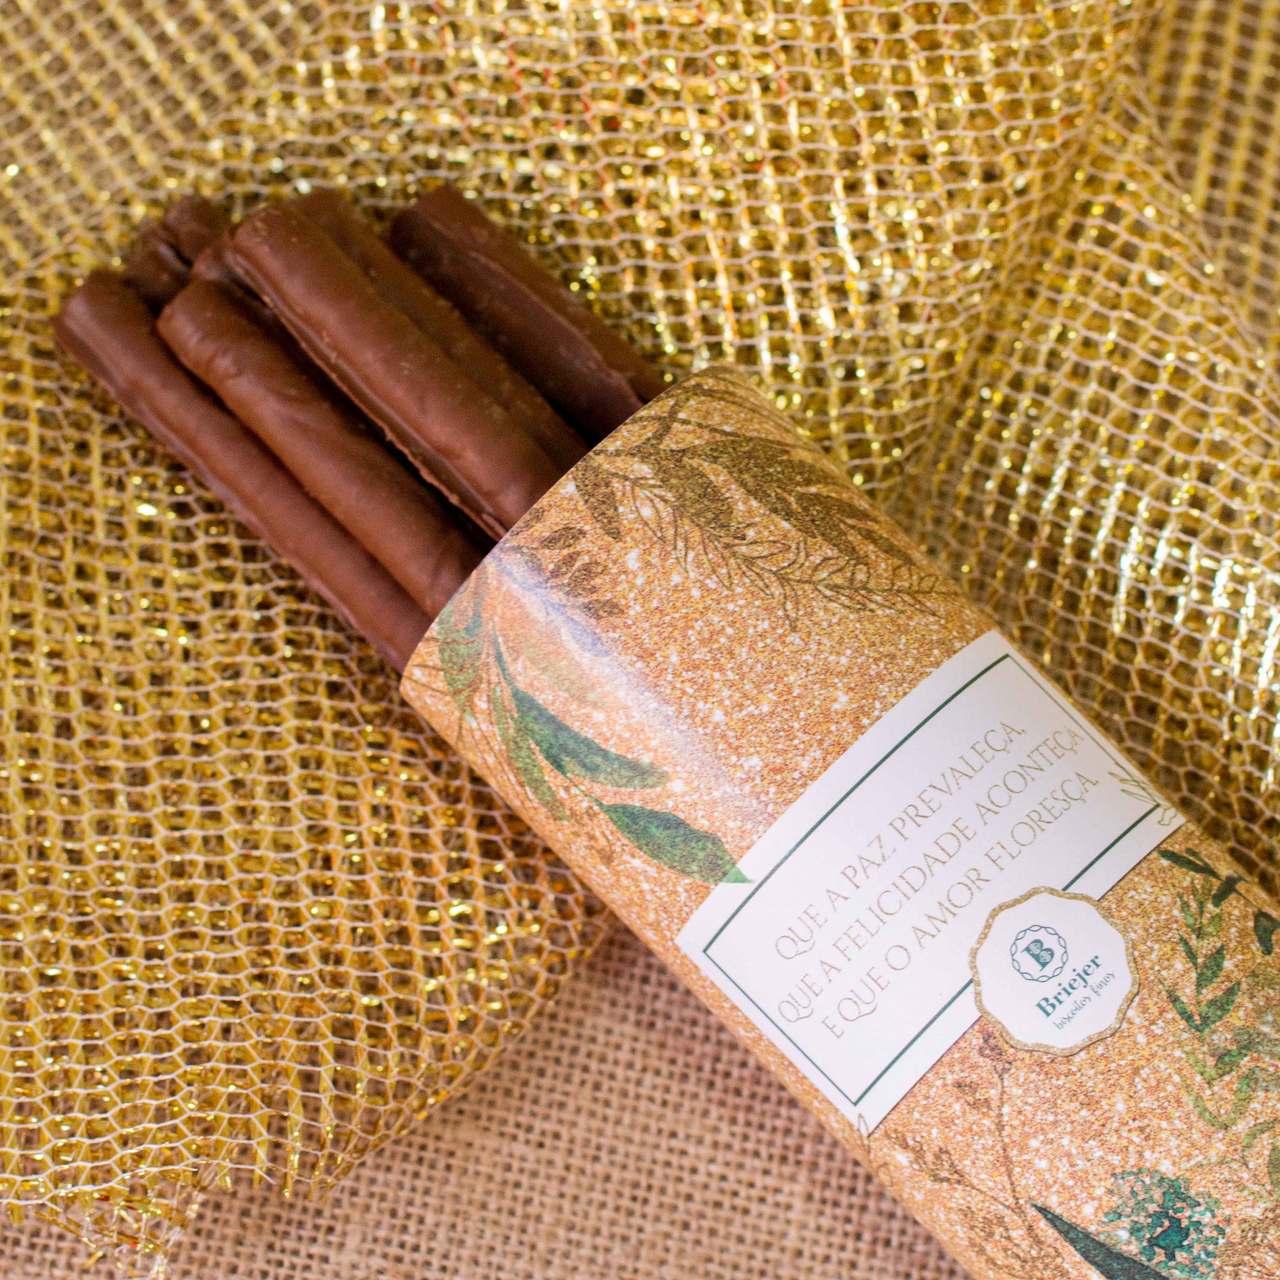 Lata Canudo Charutinho de Chocolate - Semear